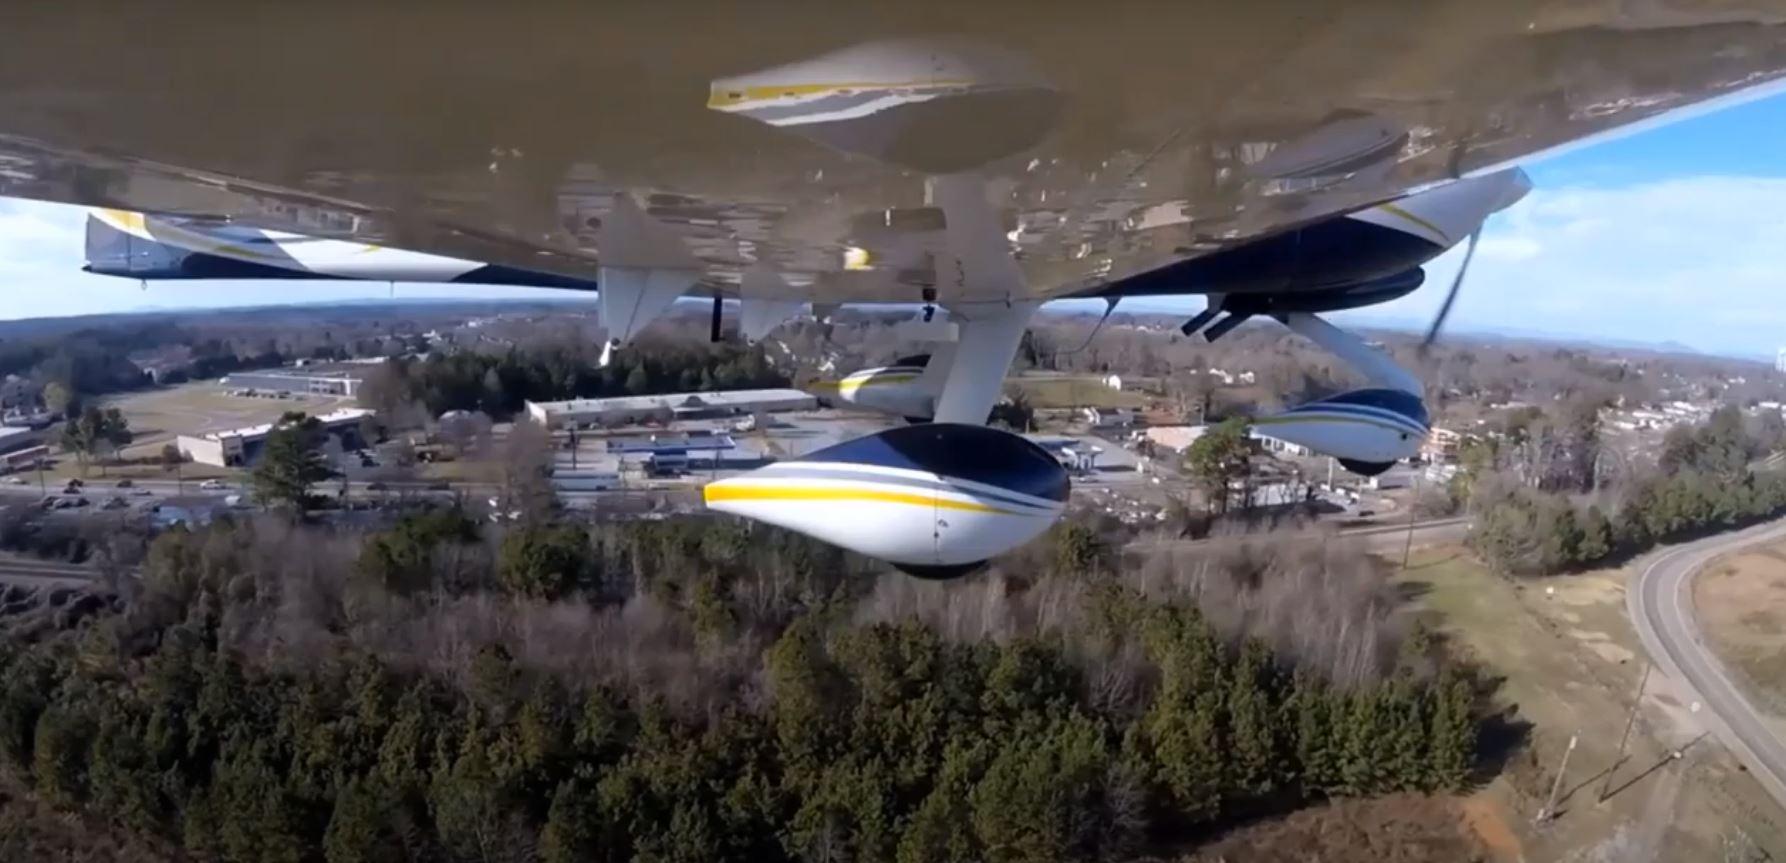 Land-DAR is designed to help pilots measure altitude during landings